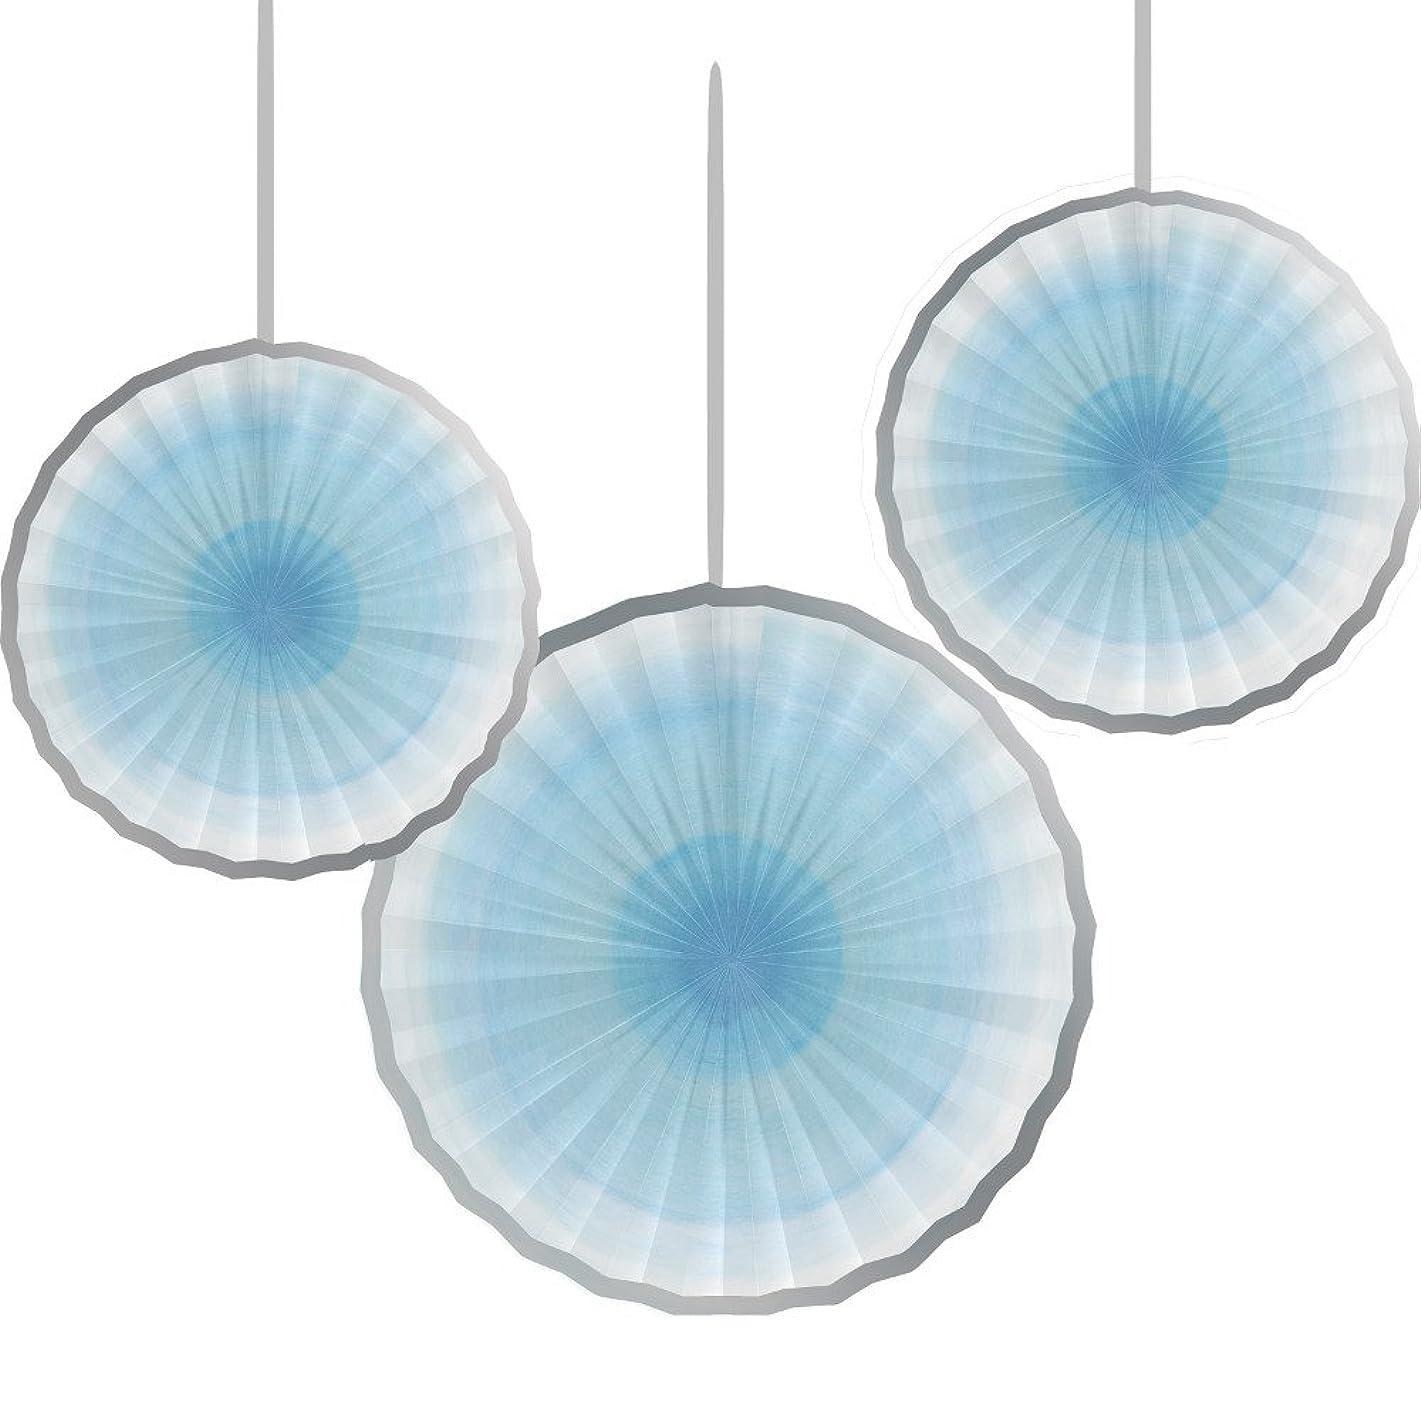 Creative Converting 322240 Festive Twinkle Little Star Boy Paper Fans, Multi Sizes, Blue